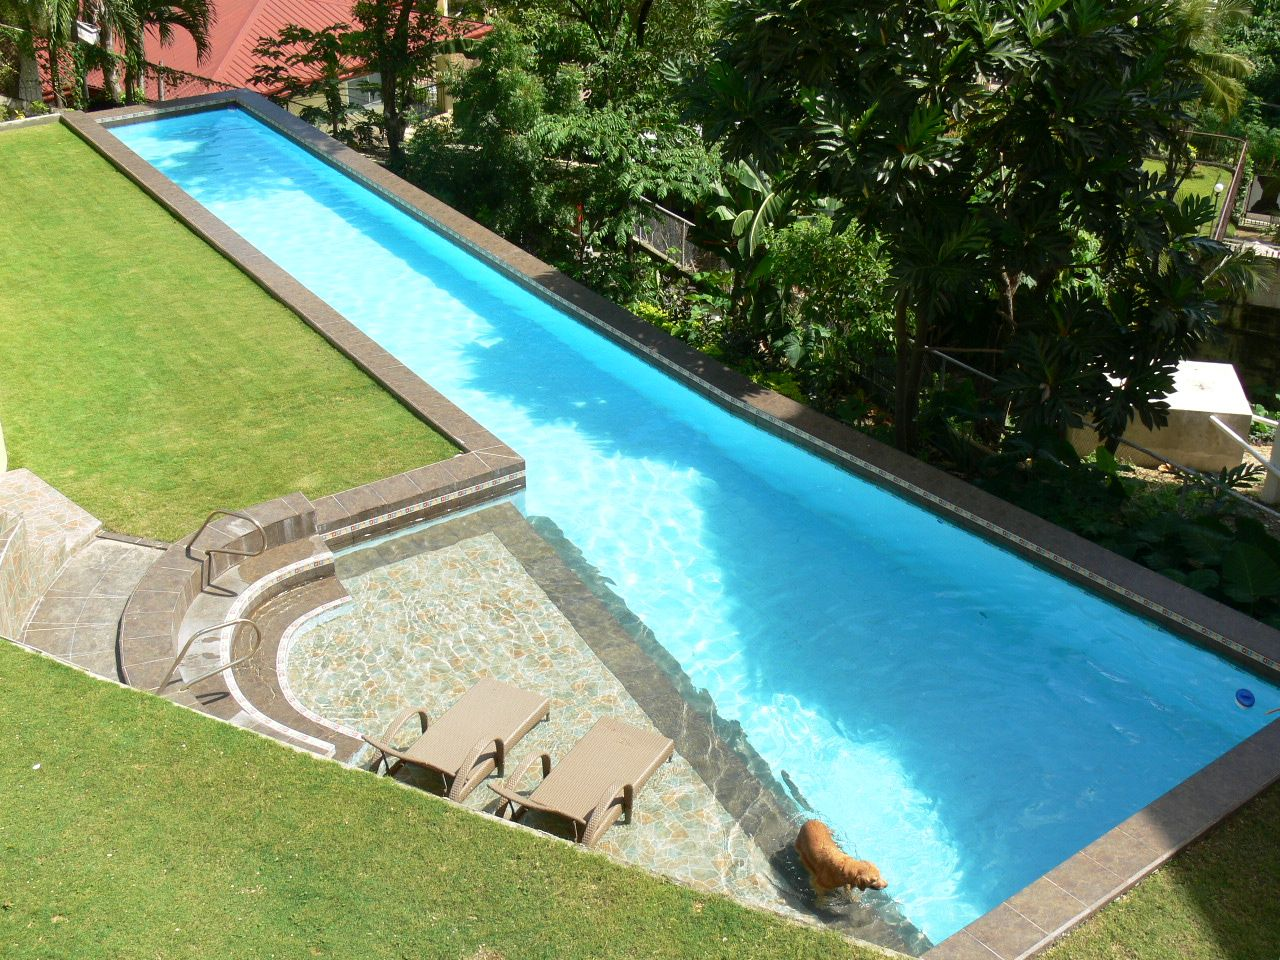 25mlappool.jpg (1280×960) Swim Pinterest Lap pools